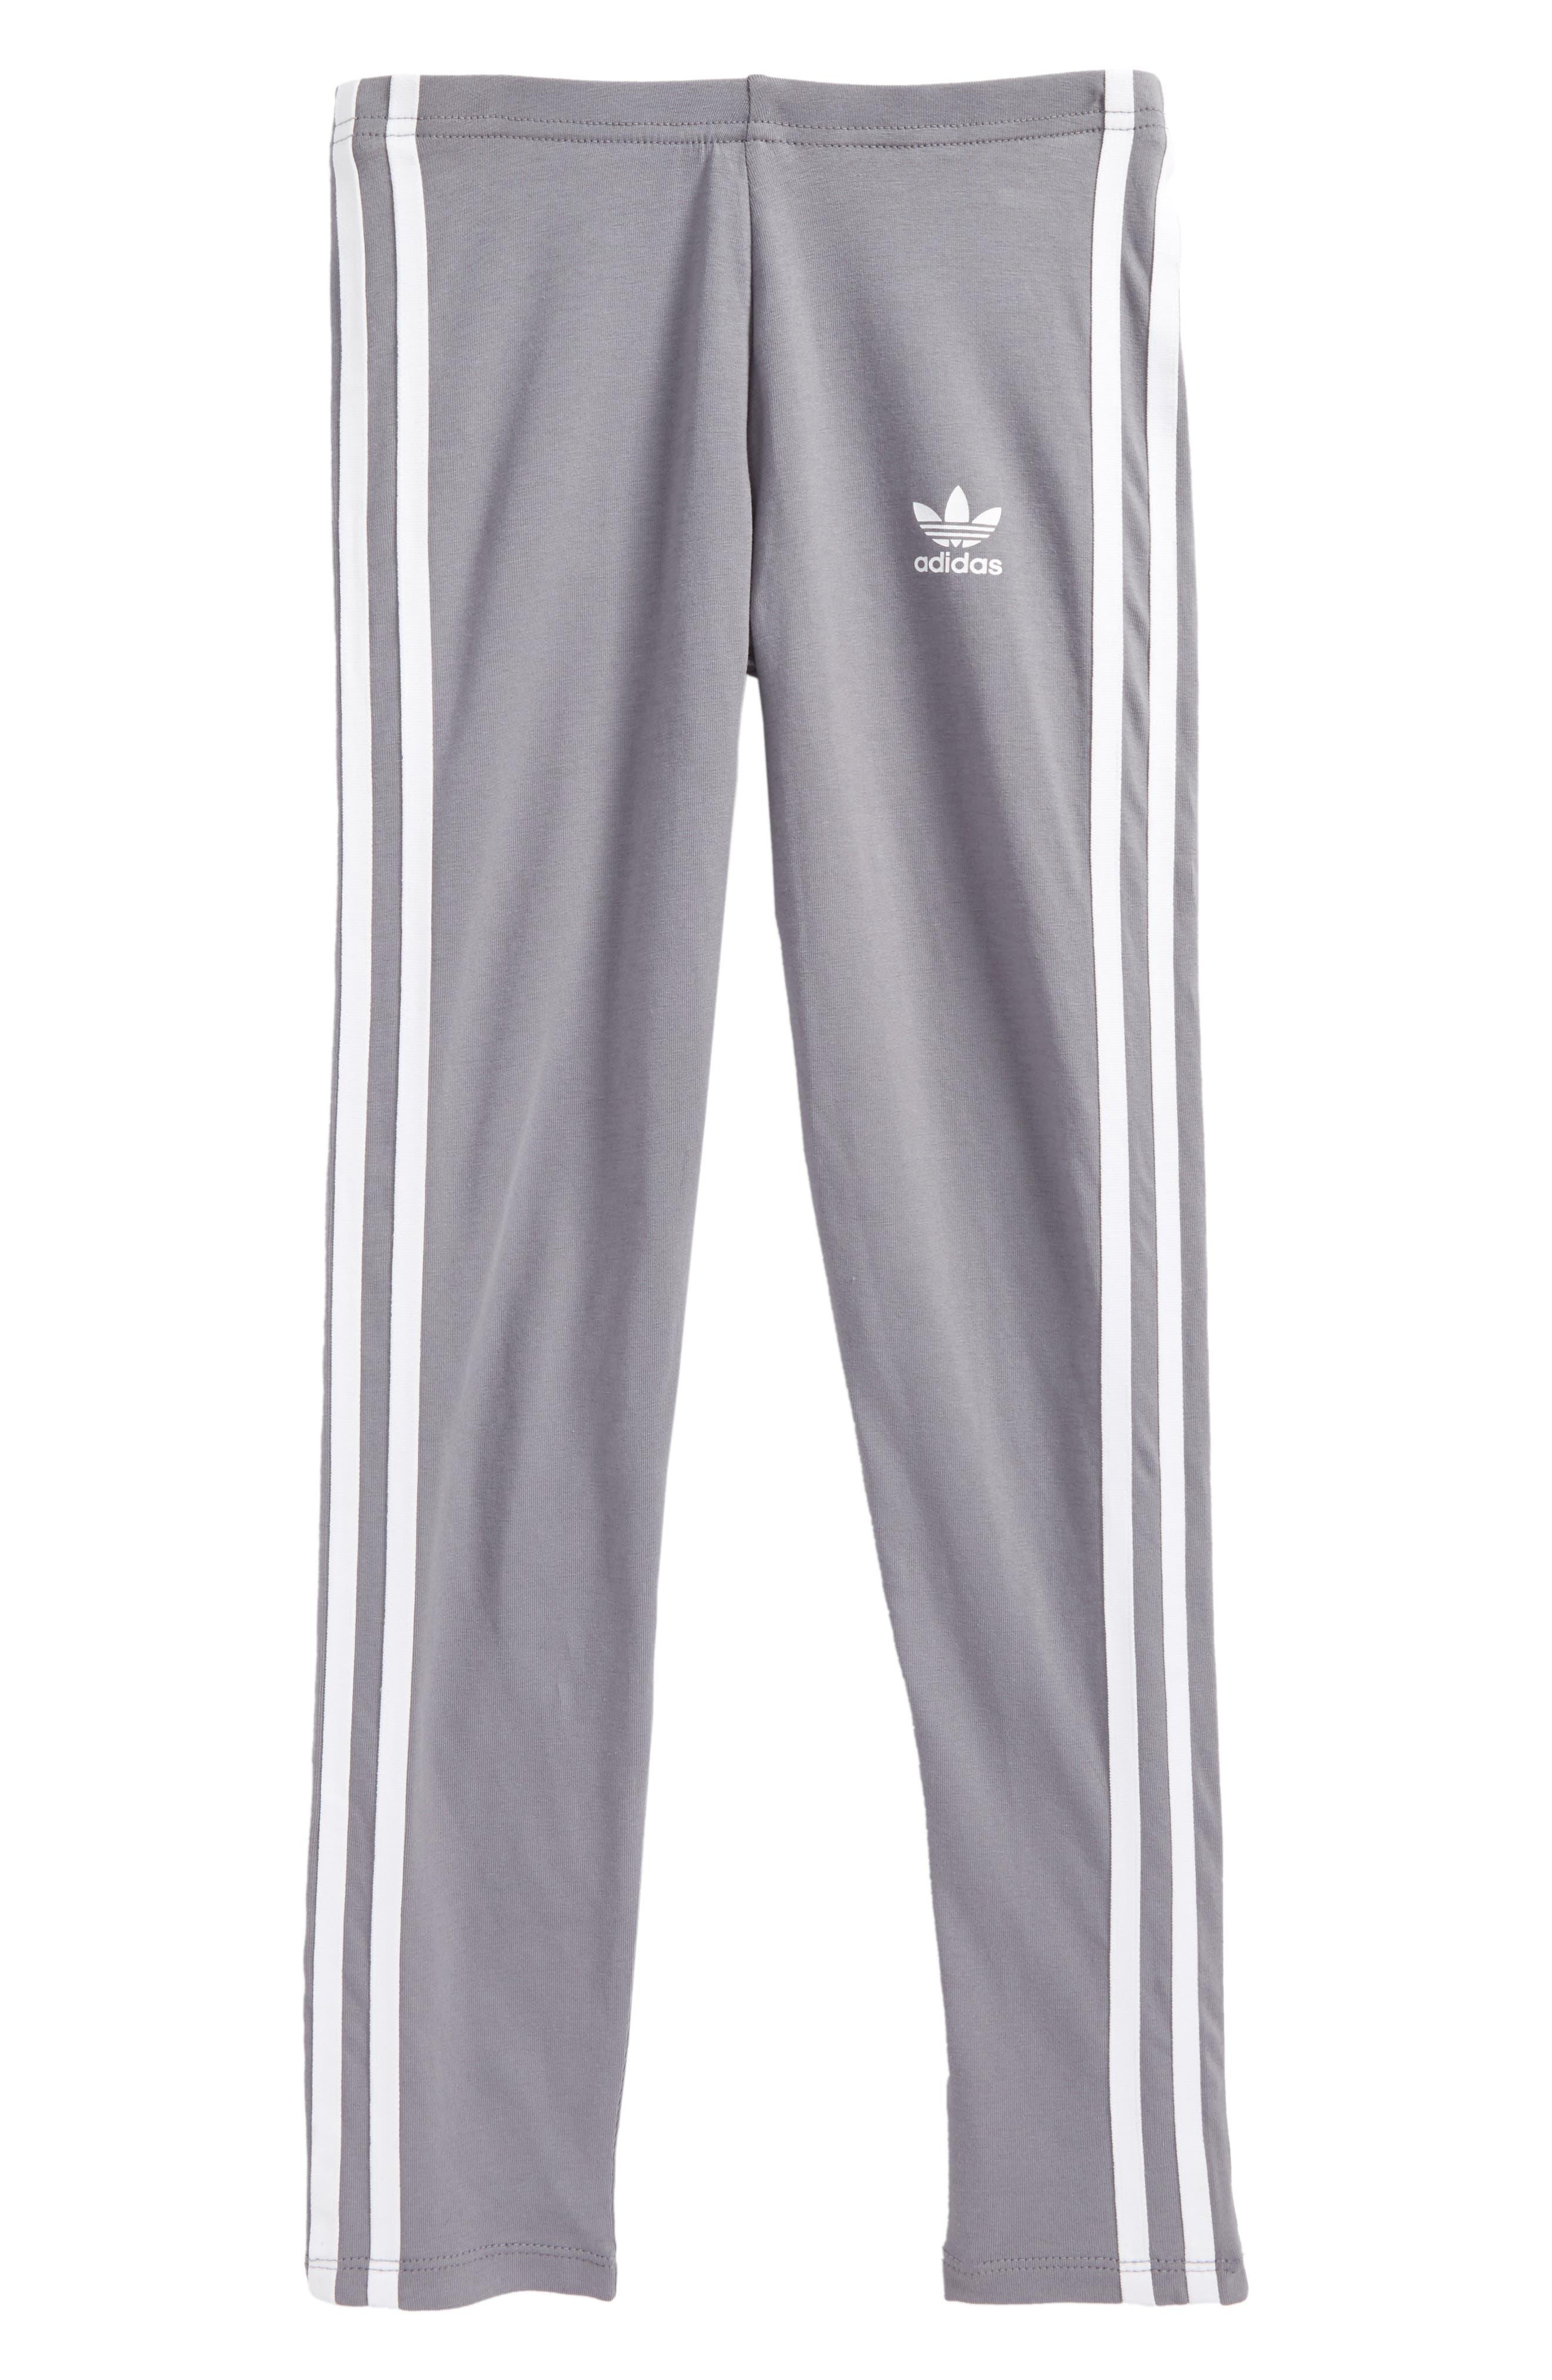 adidas 3-Stripes Leggings,                         Main,                         color, 020